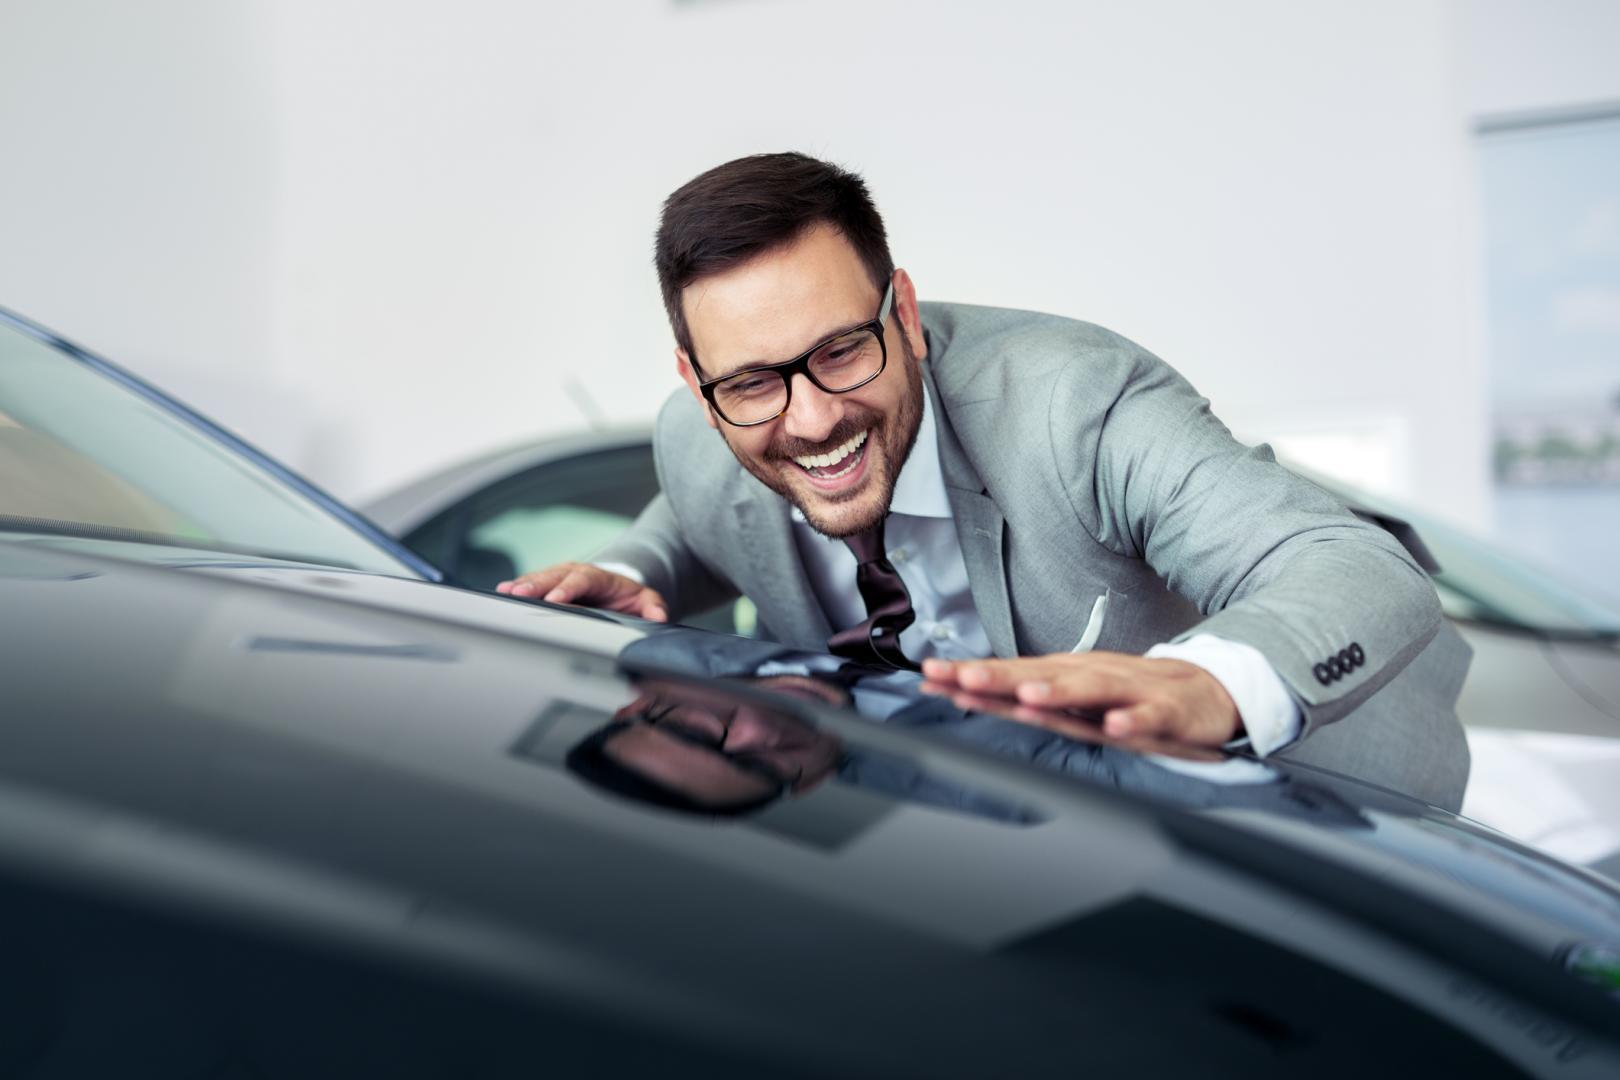 man celebrating great in-stock deal